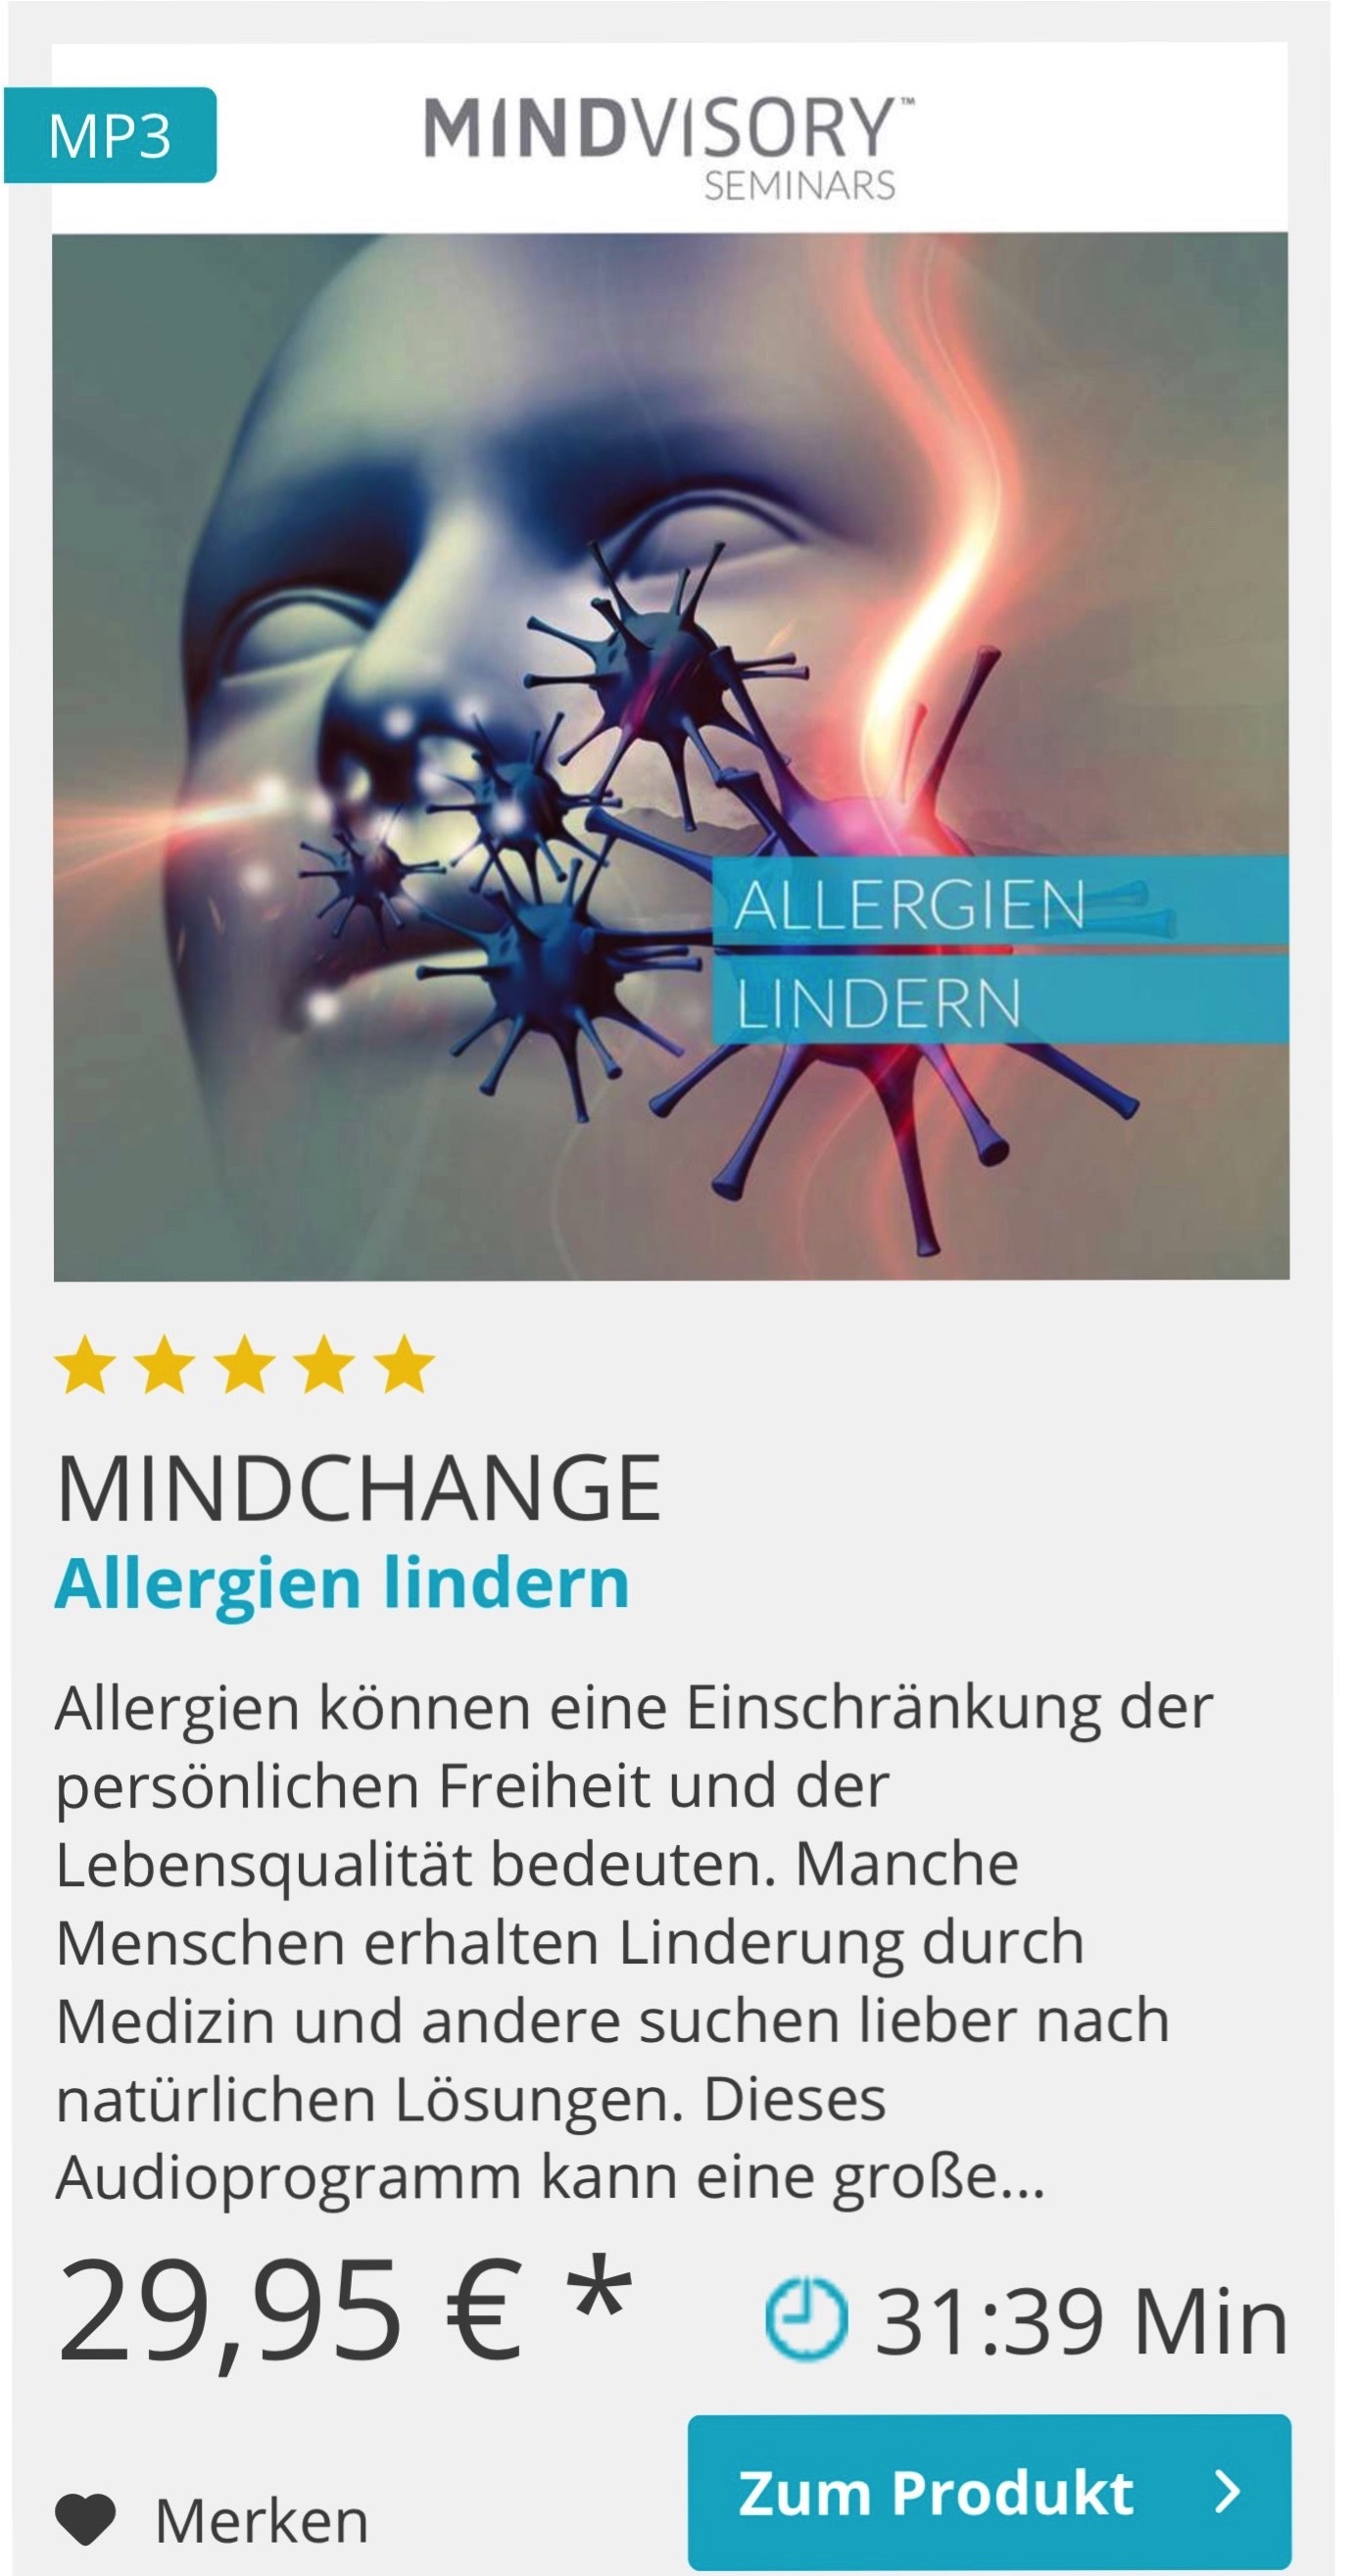 Mindvosory Allergien lindern Erfahrung